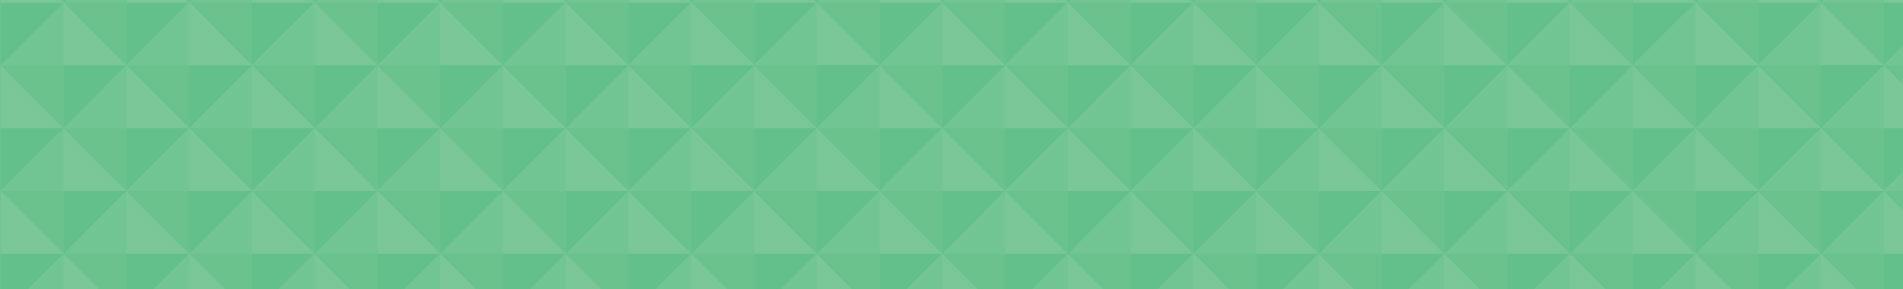 7614_WEB_Covisum_landing-page-graphics_SST-cta.jpg